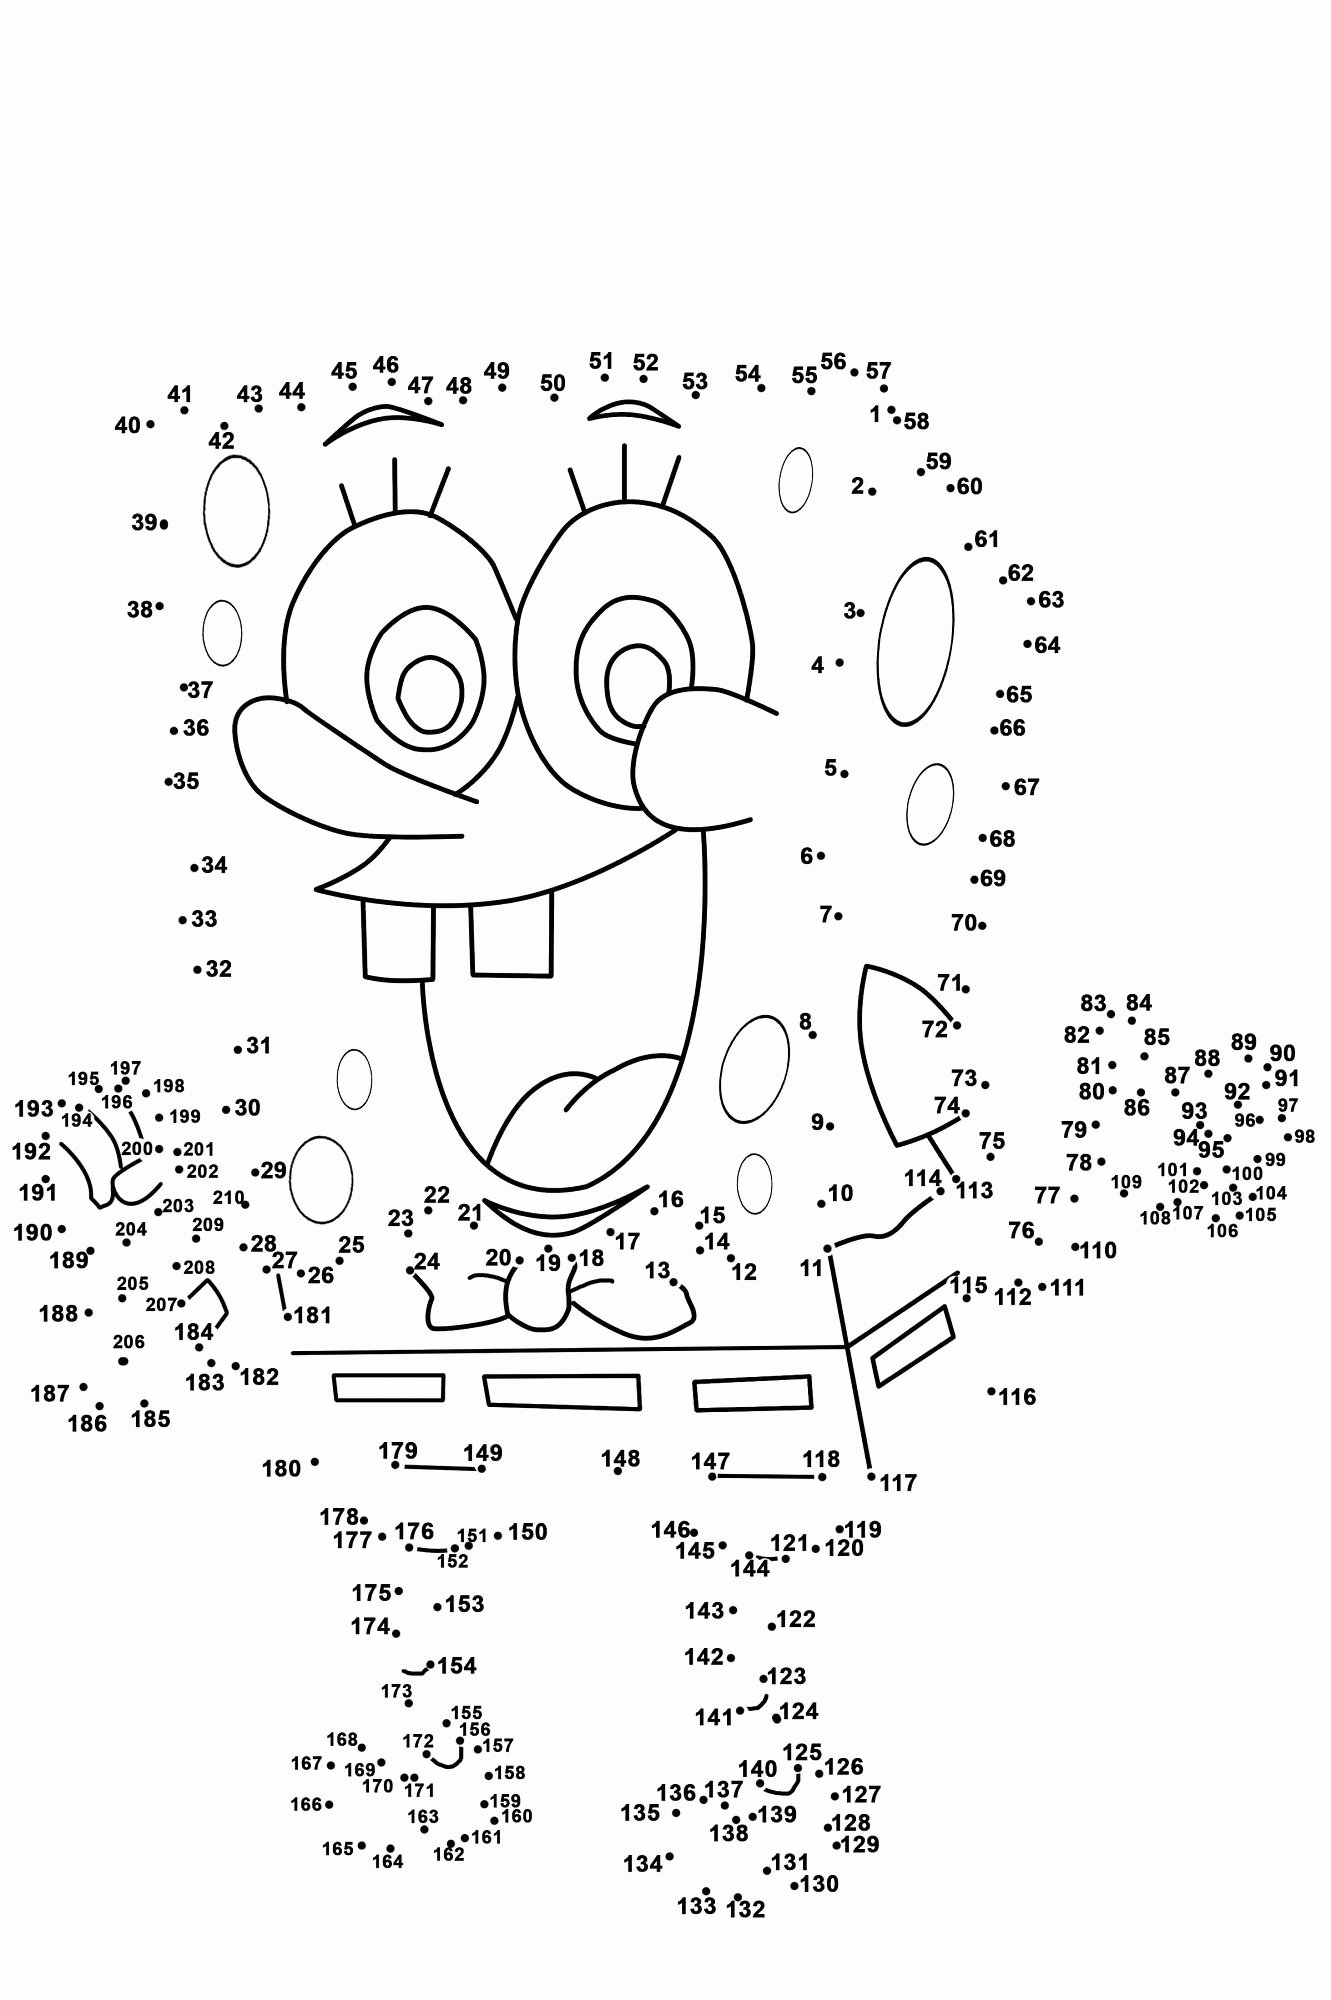 Dot to Dot Worksheets for Preschoolers Lovely Dot to Dot Printables